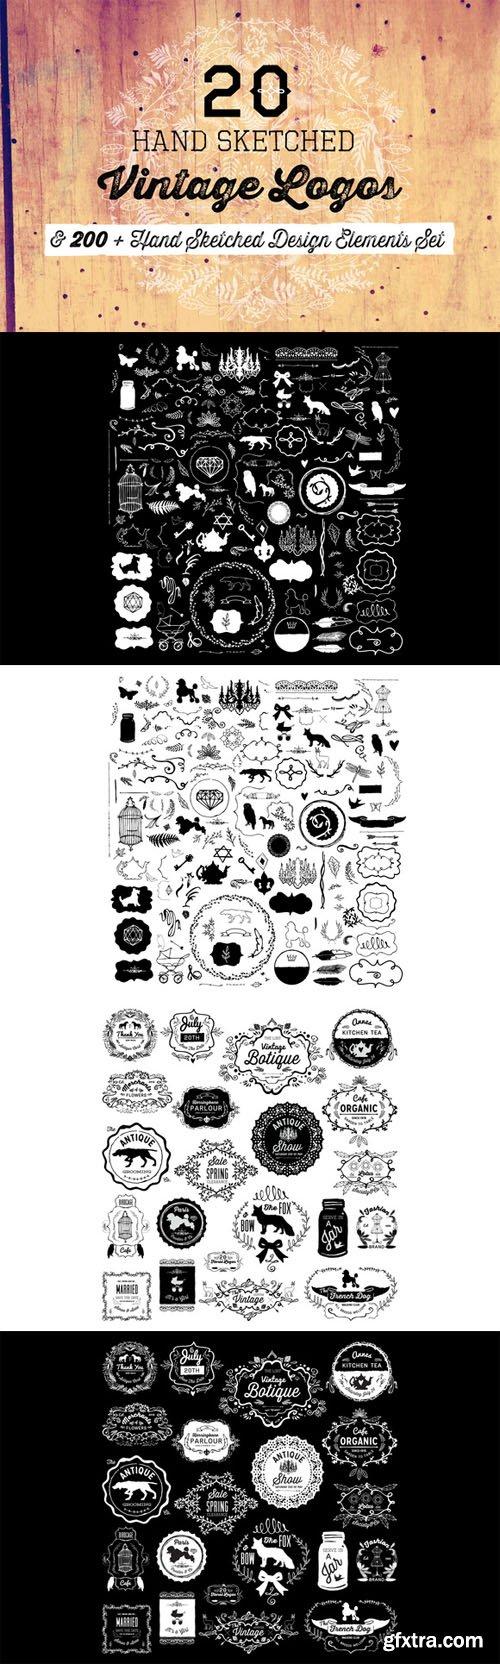 CreativeMarket - 20 Logos & 200+ Design Elements 117016